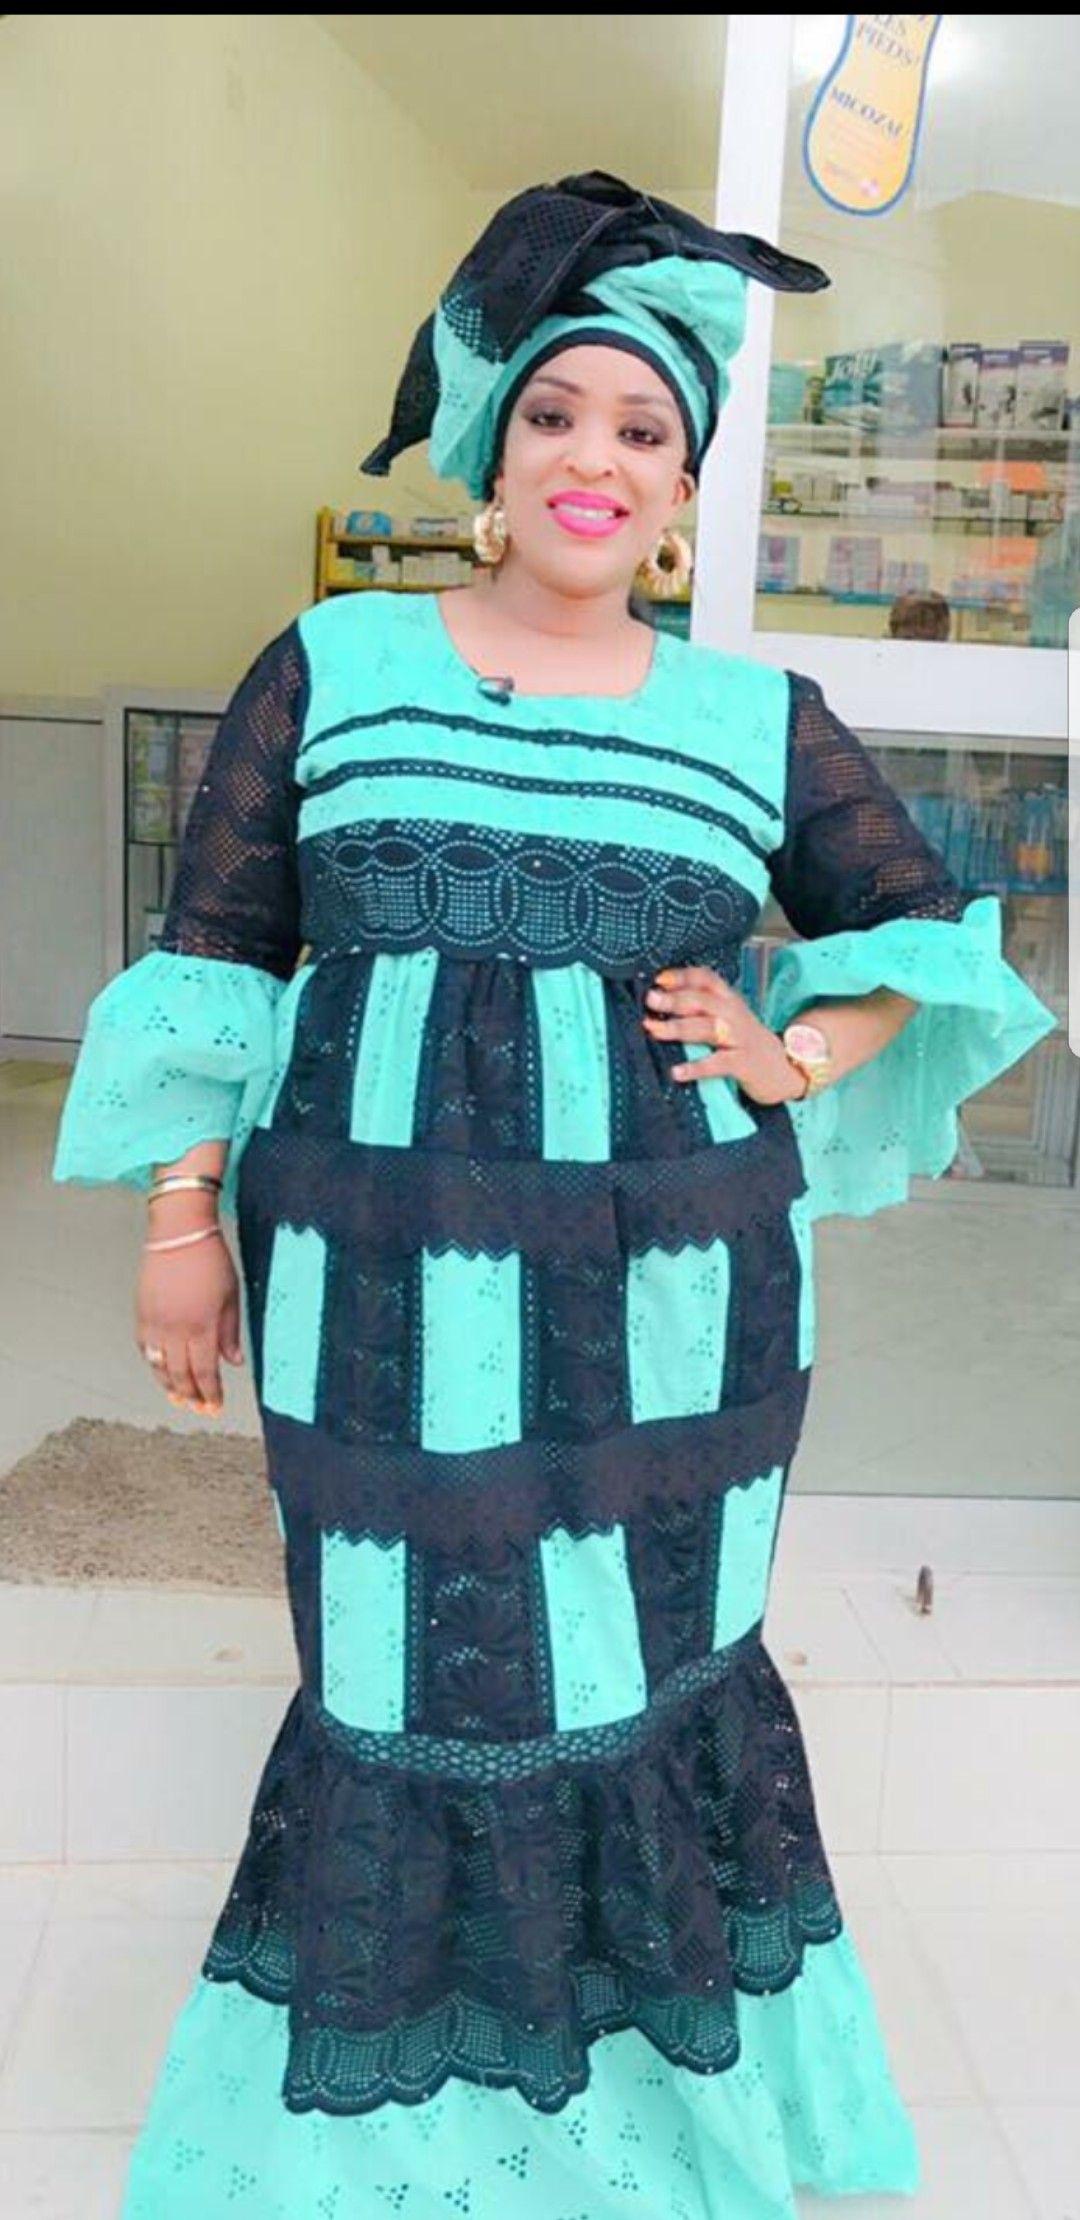 pingl par coulibaly sur mode pinterest mode africaine boubou et tenue africaine. Black Bedroom Furniture Sets. Home Design Ideas